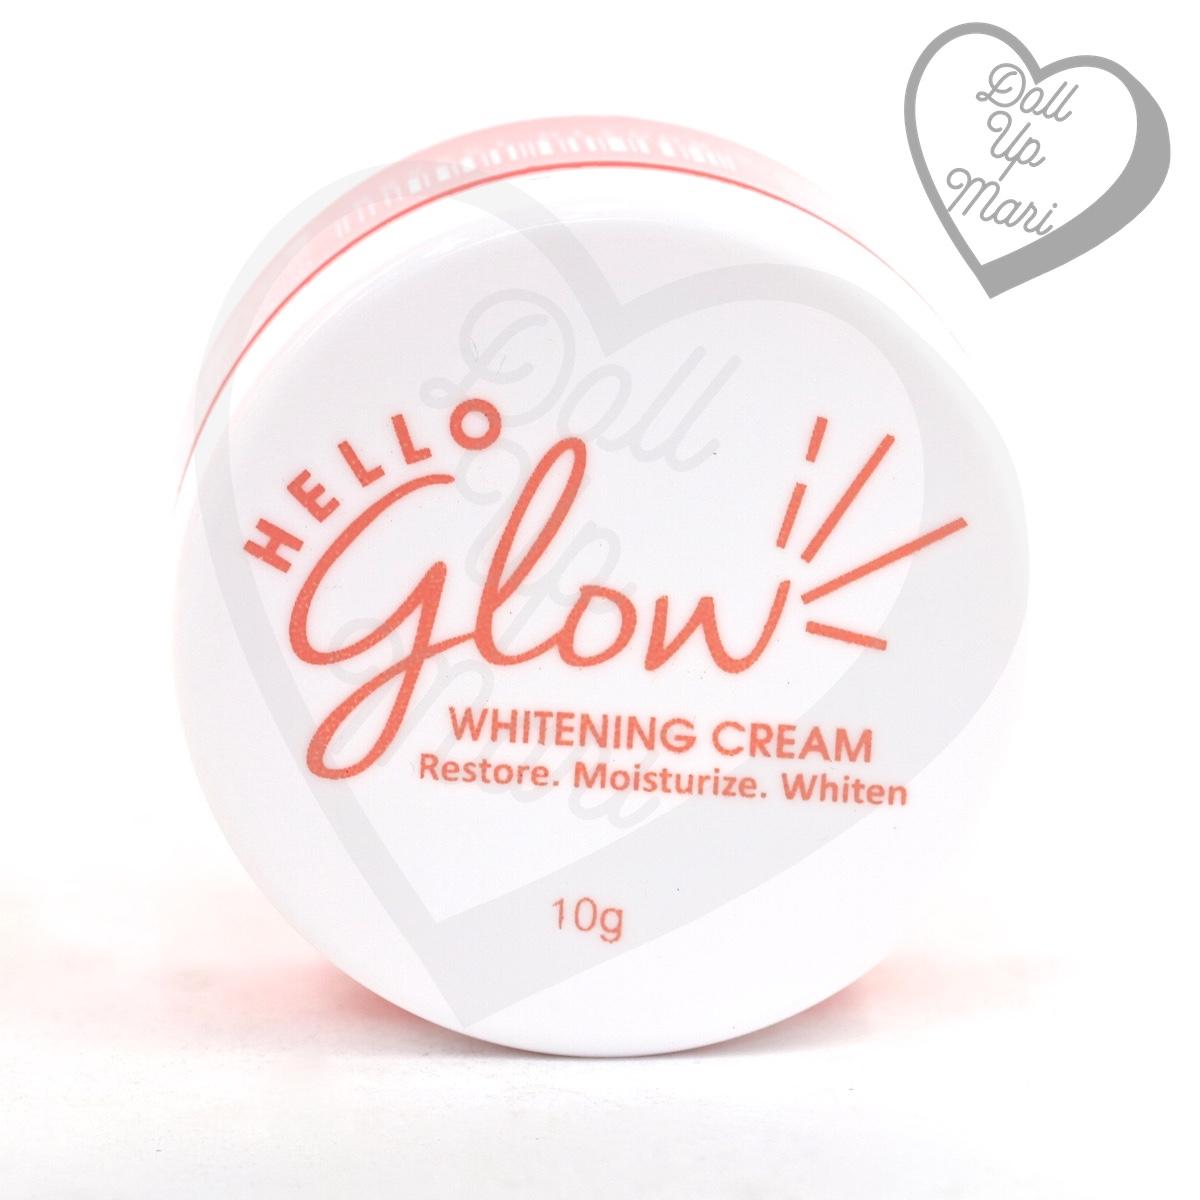 Hello Glow by Ever Bilena Whitening Cream Jar Cover